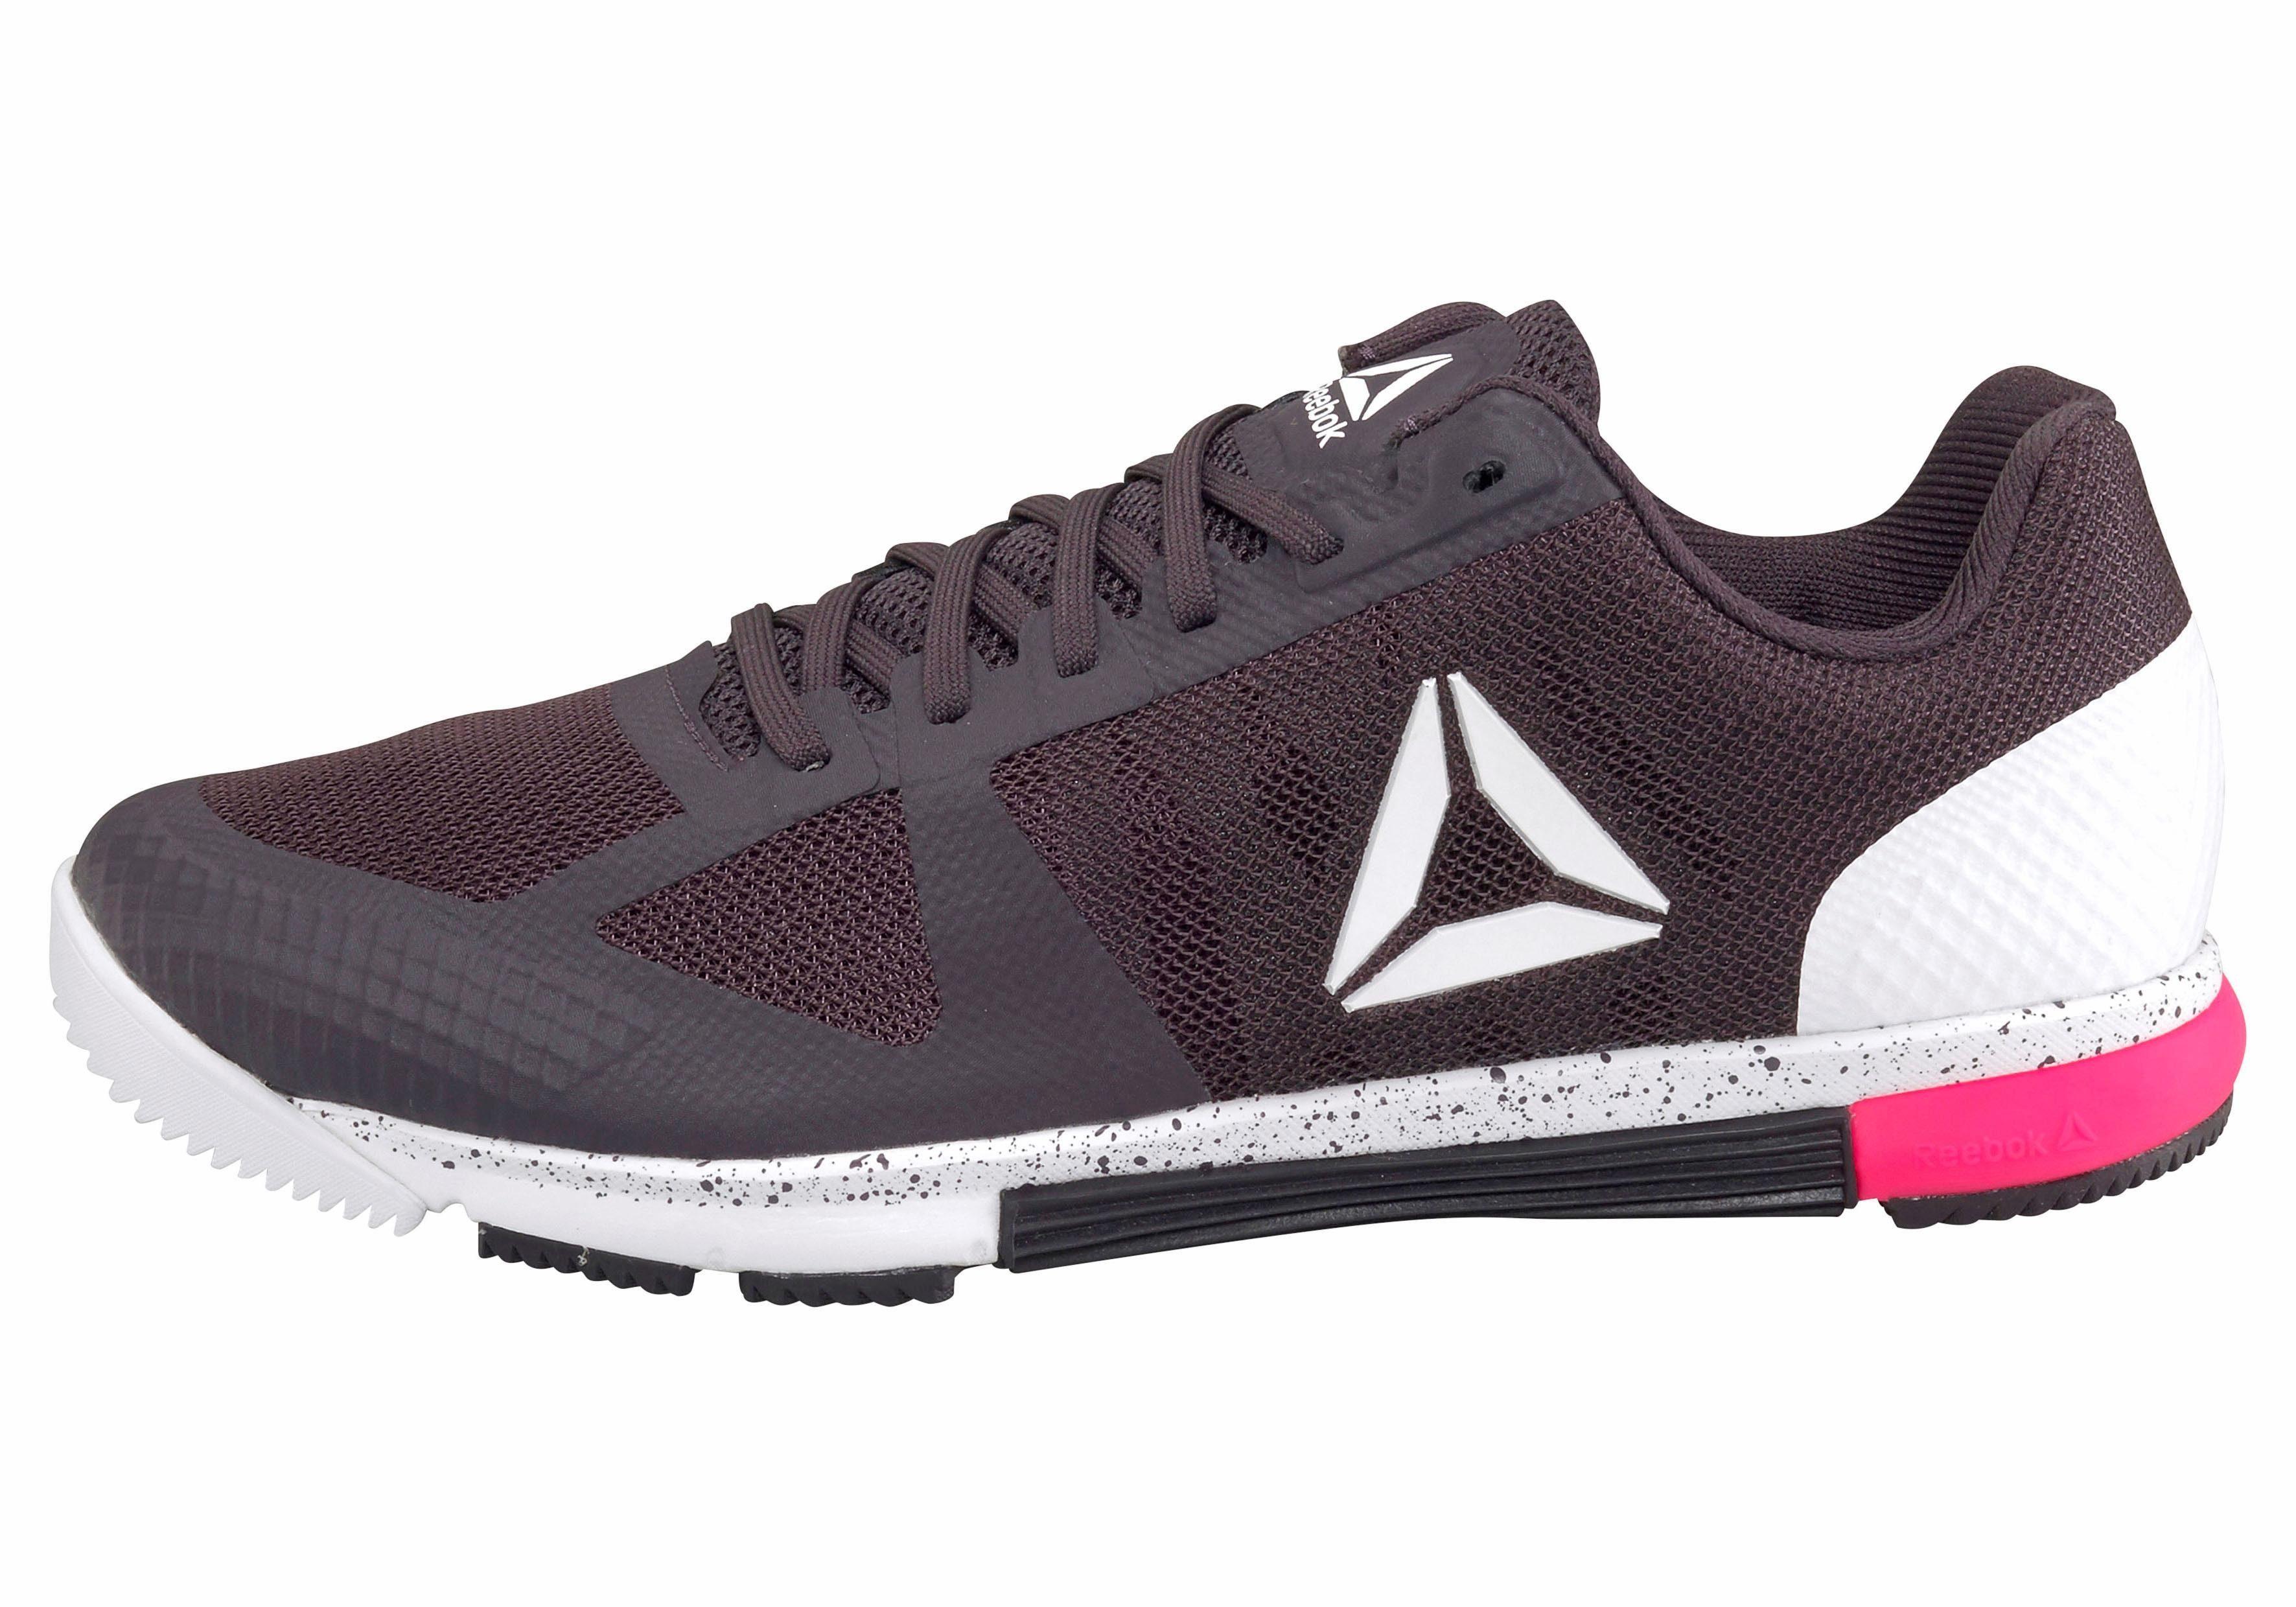 Reebok - Chaussures De Formation Crossfit Vitesse Tr - Femmes - Chaussures - Noir - 40,5